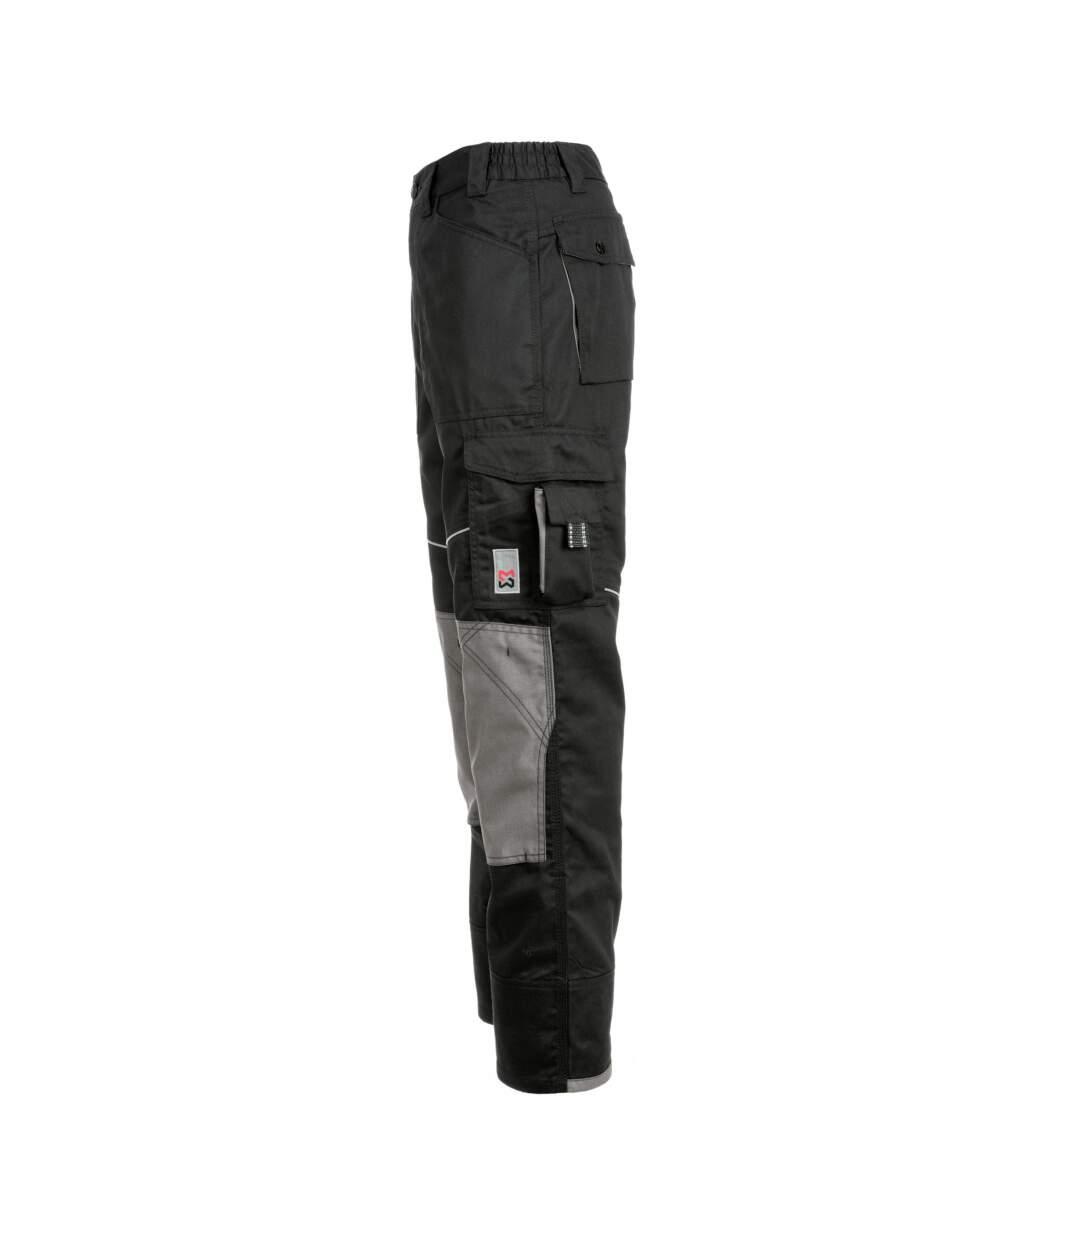 Pantalon de travail Starline Plus Würth MODYF noir